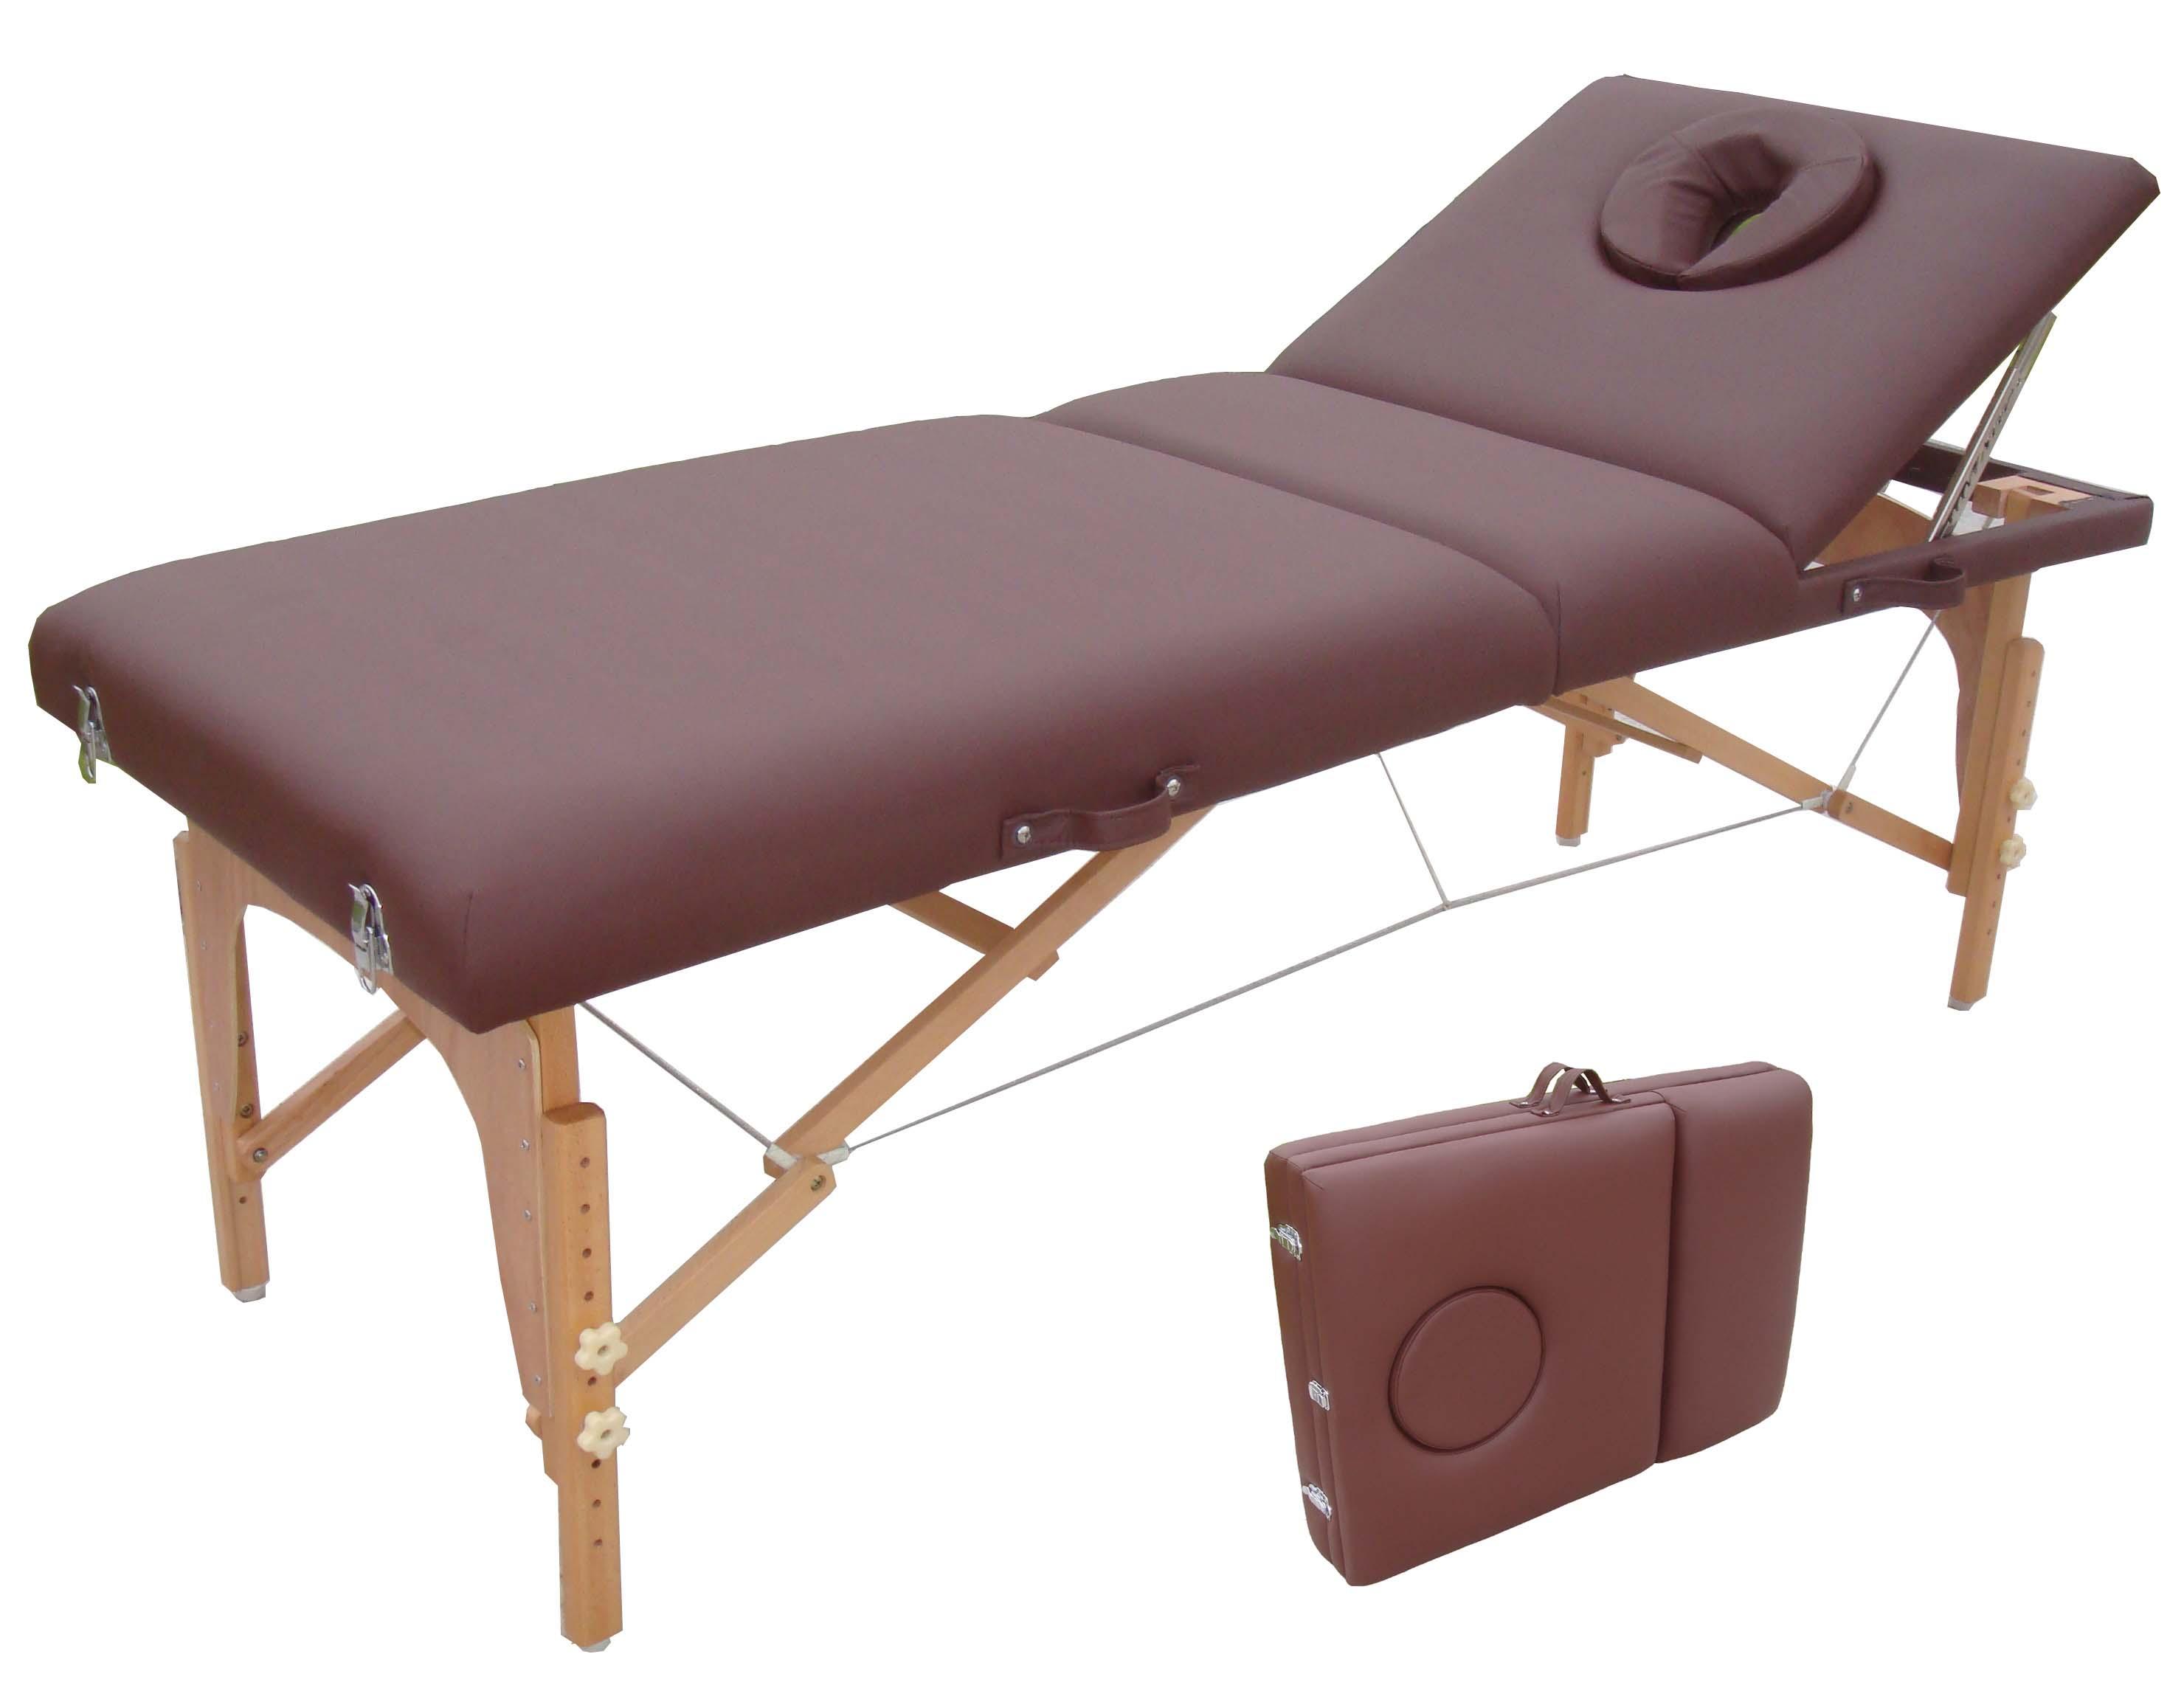 Huangshan City Shexian Comfort Massage Appliance Co Ltd